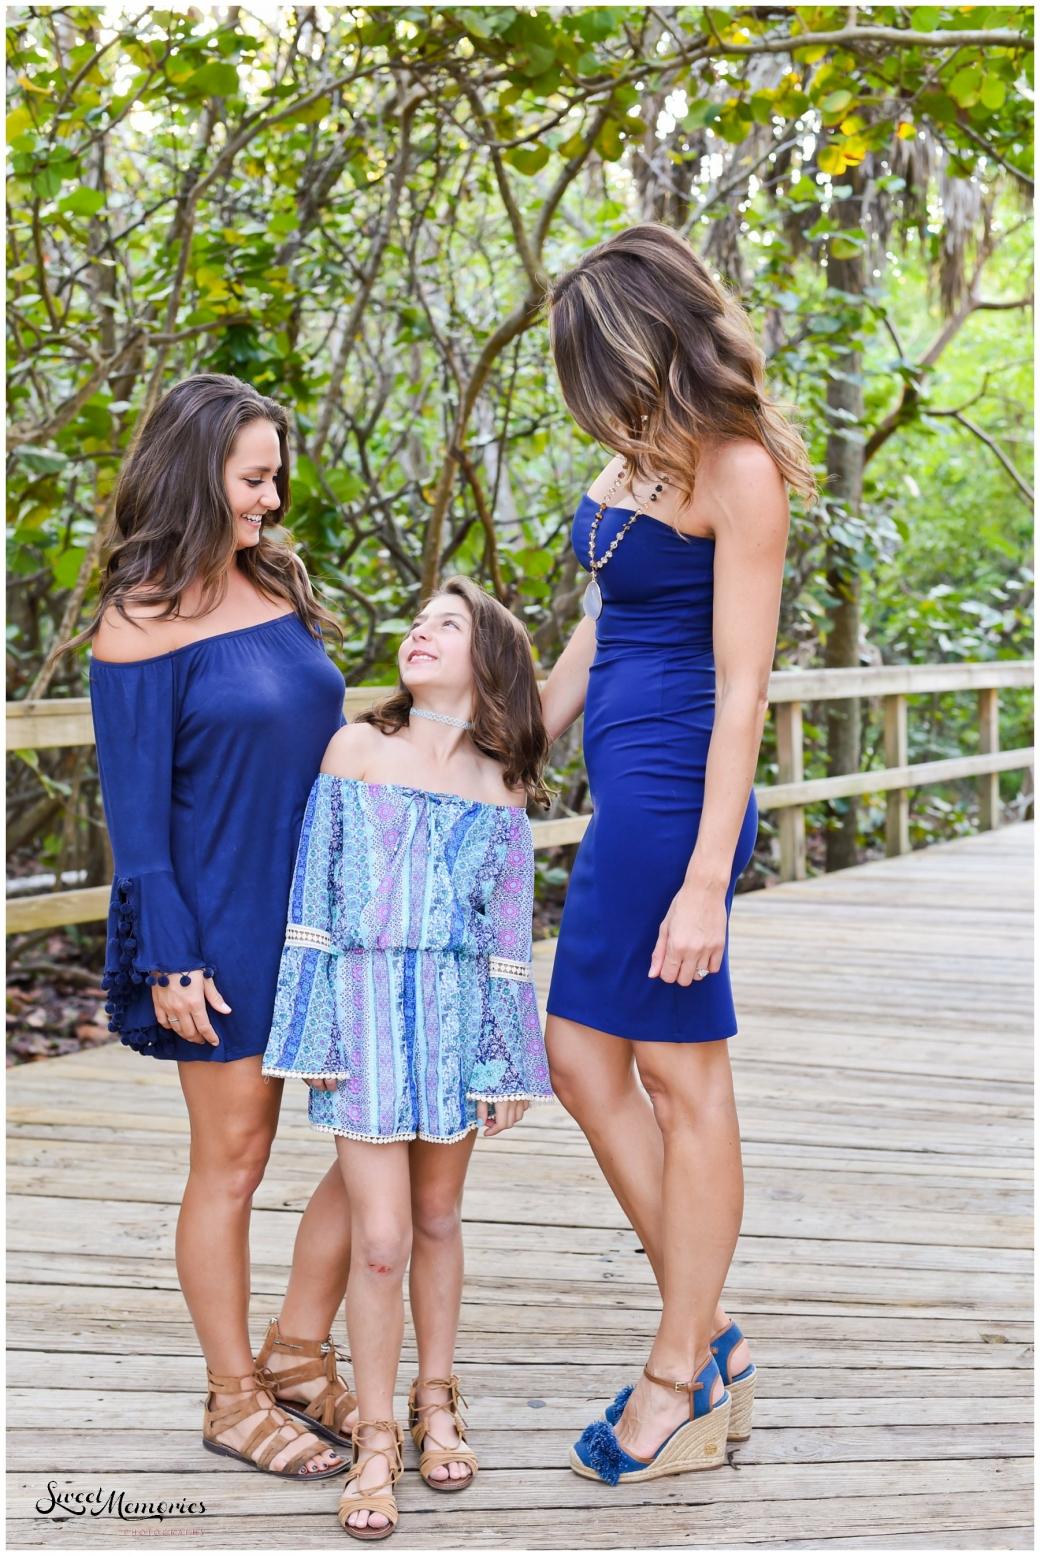 A Boca Raton Family | Fort Lauderdale Photographer